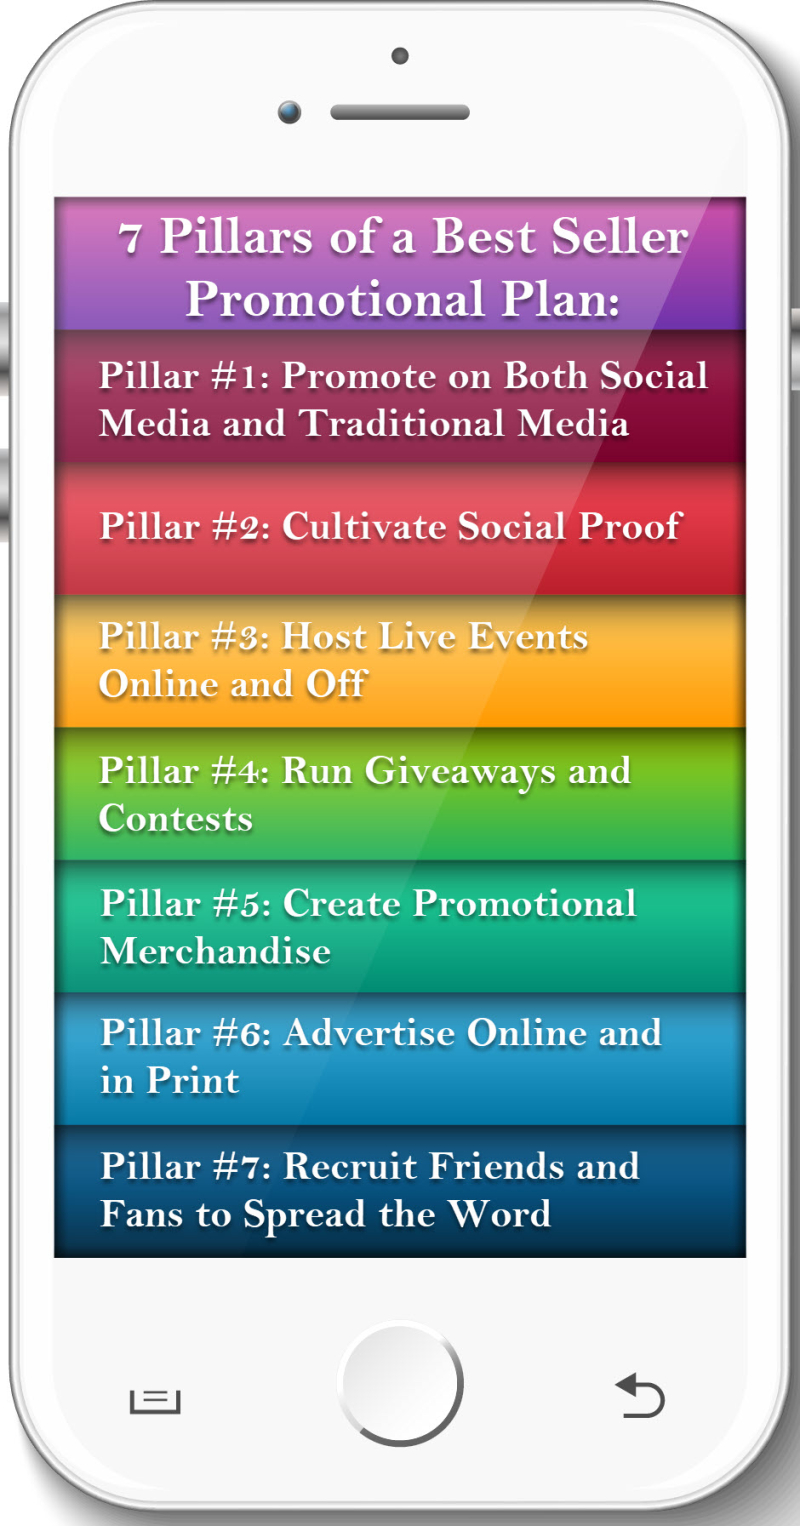 7 Pillars of Promtional Plan